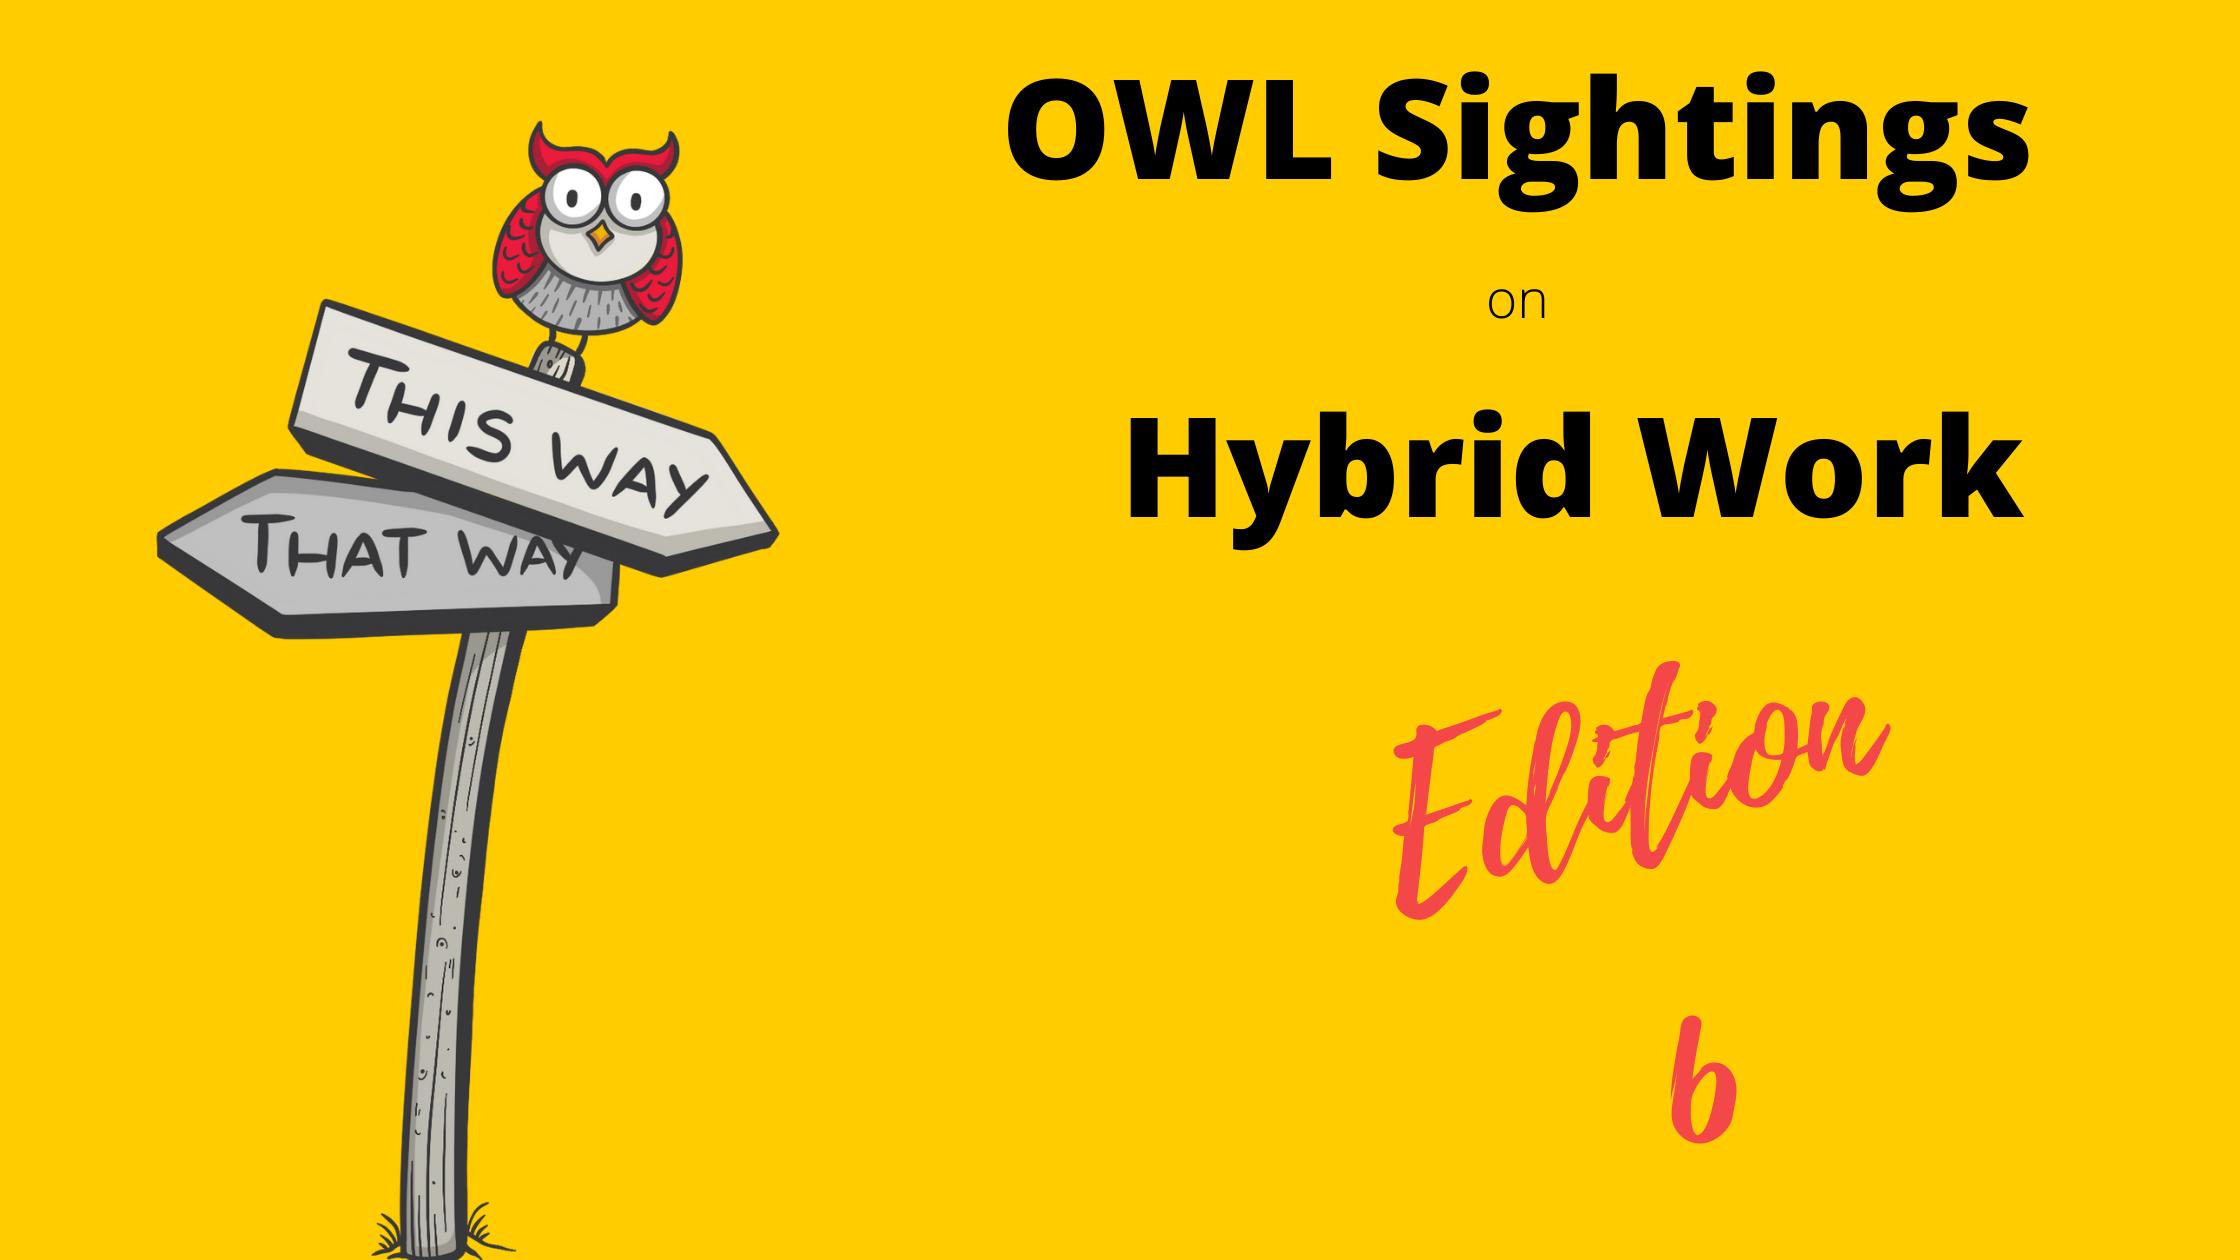 OWLSightings_HybridWork_Edition6